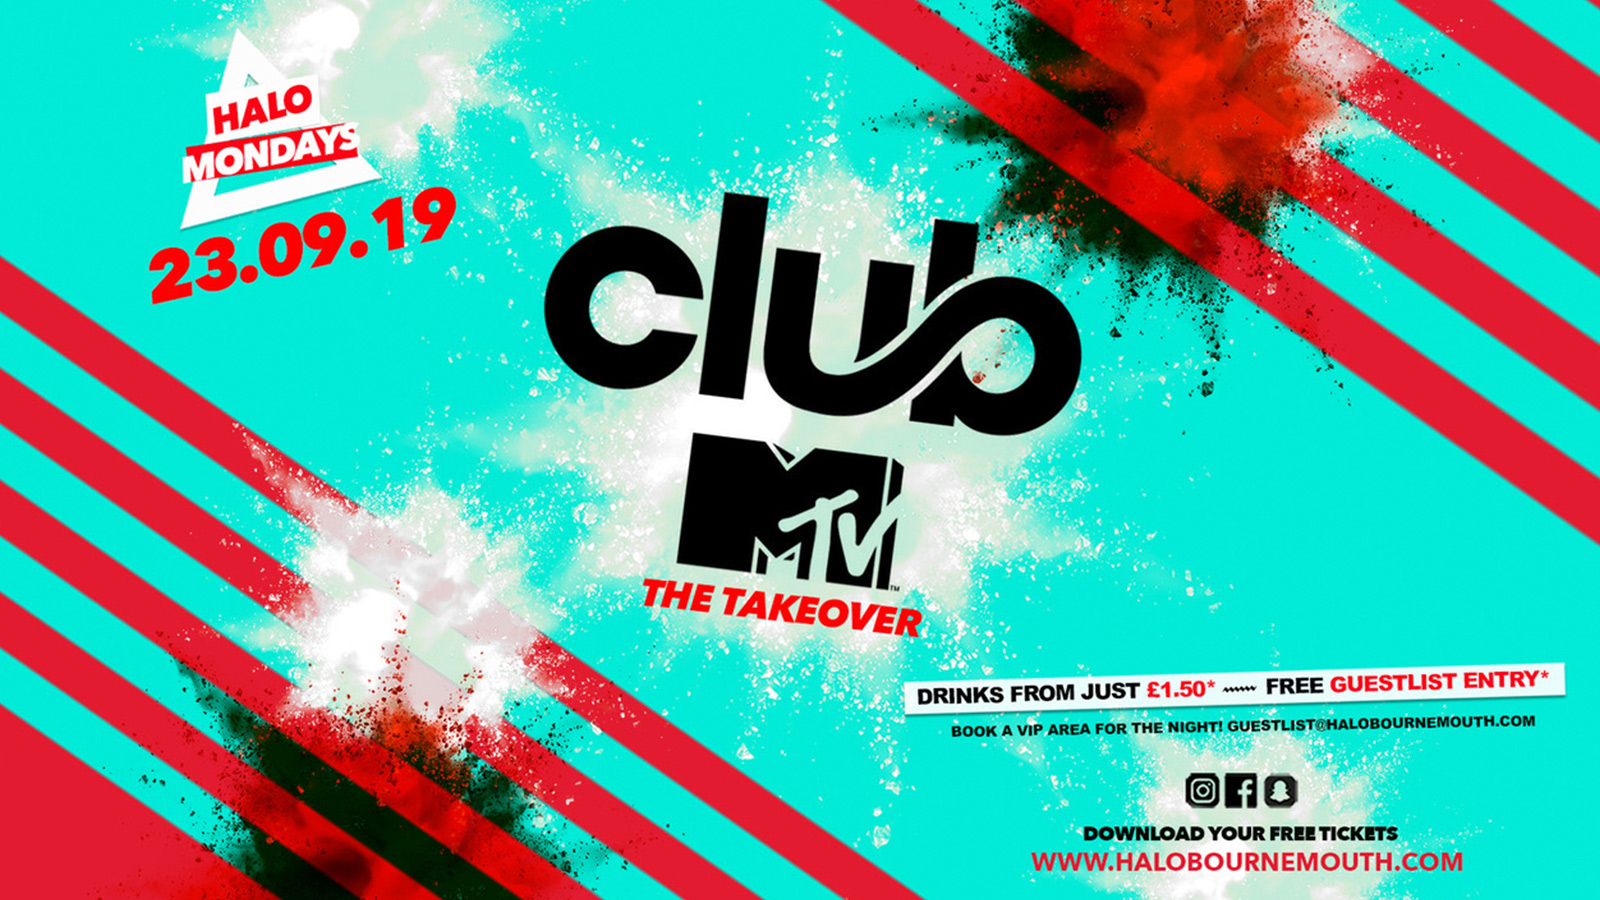 Halo Mondays 23.09 //// Drinks from £1.50 – Bournemouth's Biggest Student Night // MTV Freshers Launch // Bournemouth Freshers